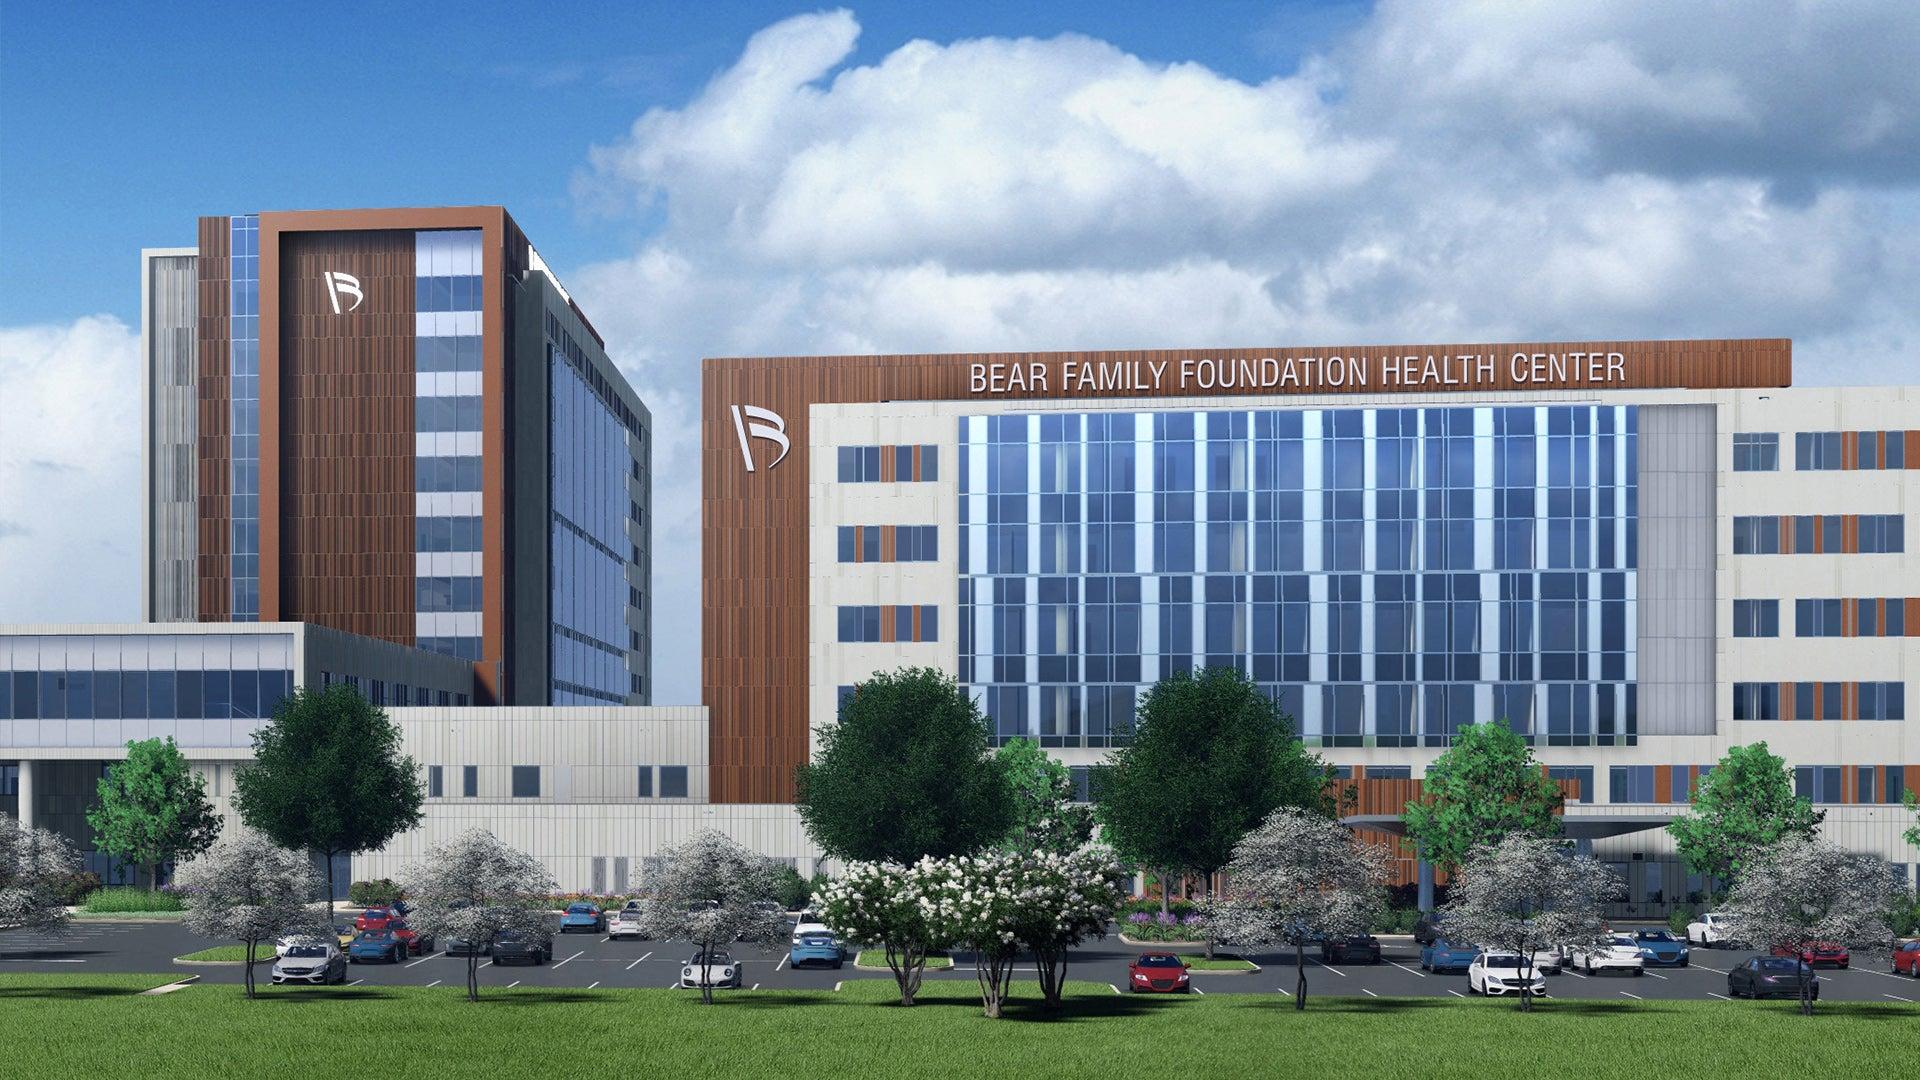 Bear Family Foundation Health Center